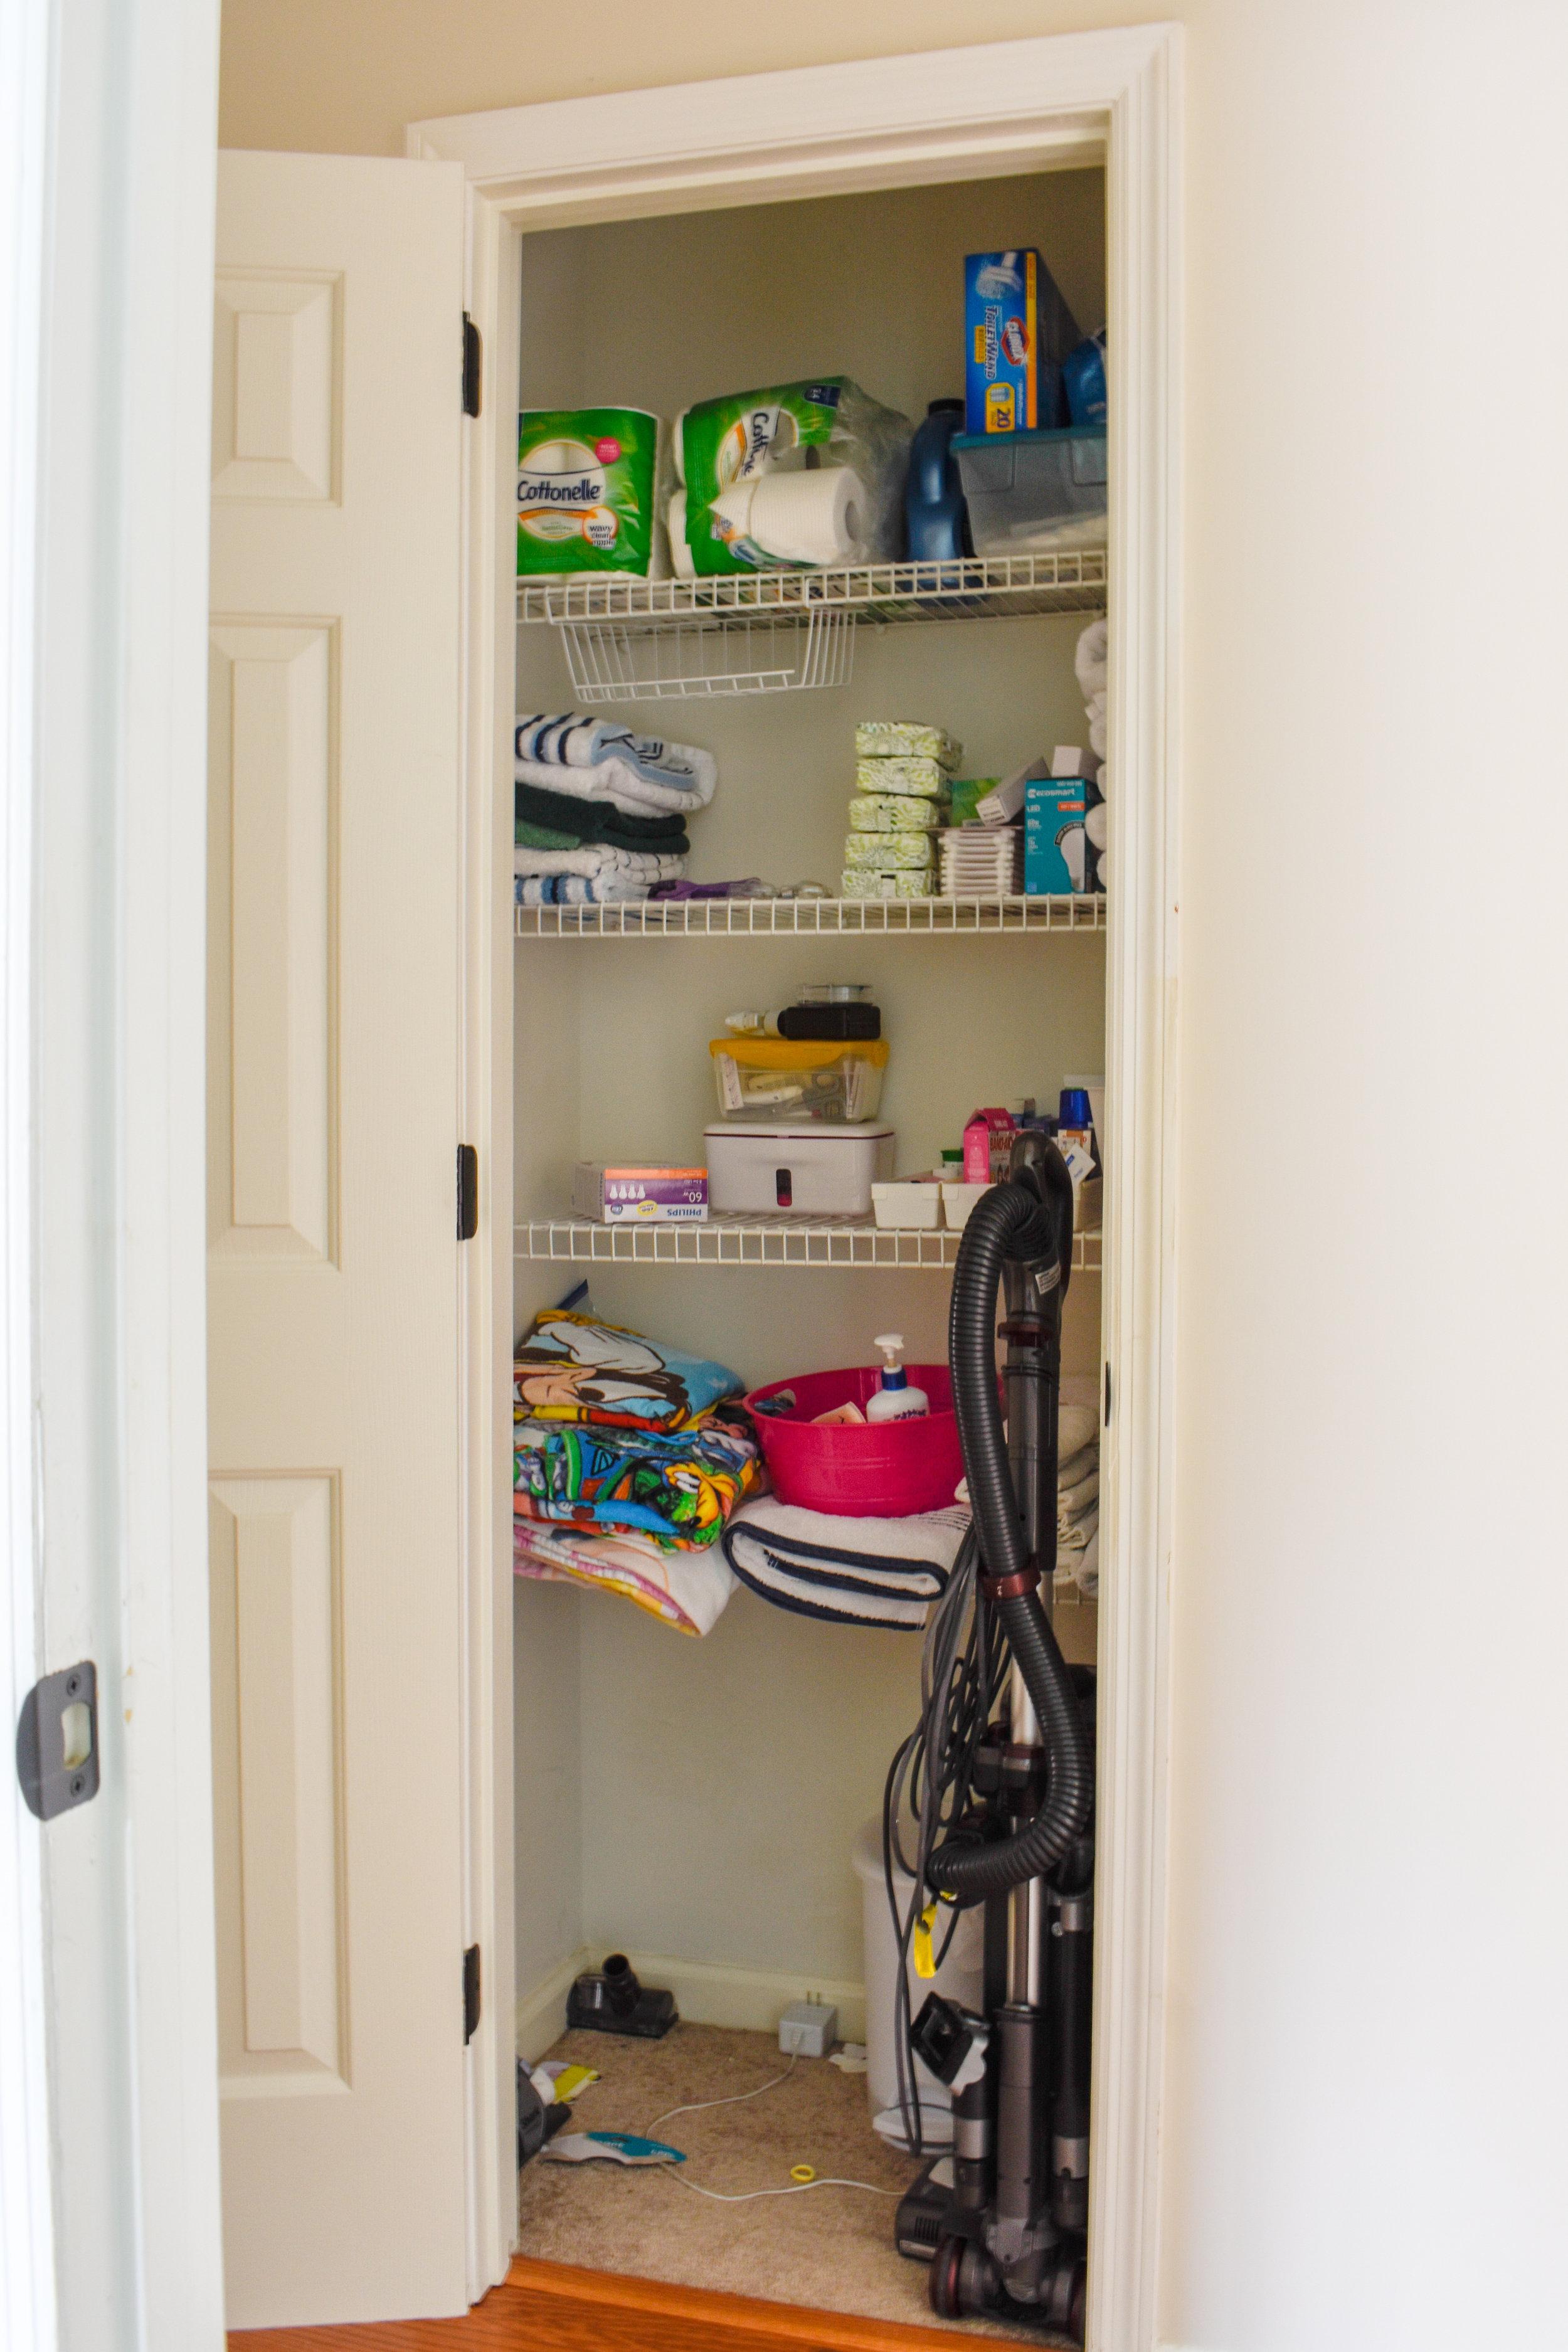 Bathroom Organizing Diy Under Cabinet Bathroom Storage T Moore Home Design Diy And Affordable Decorating Ideas